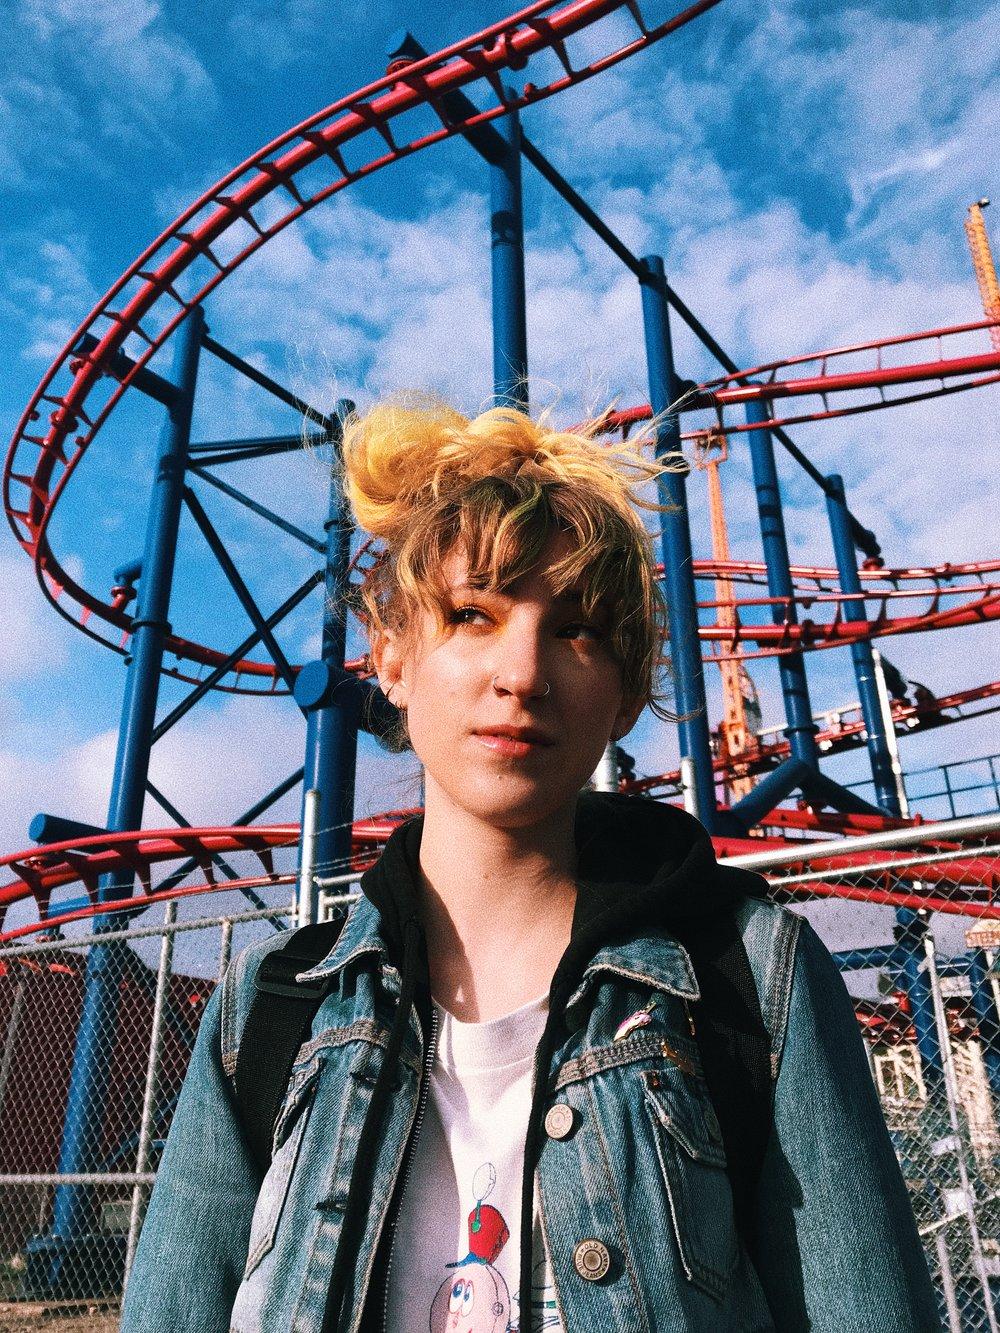 Hannah Coney Island Roller Coaster